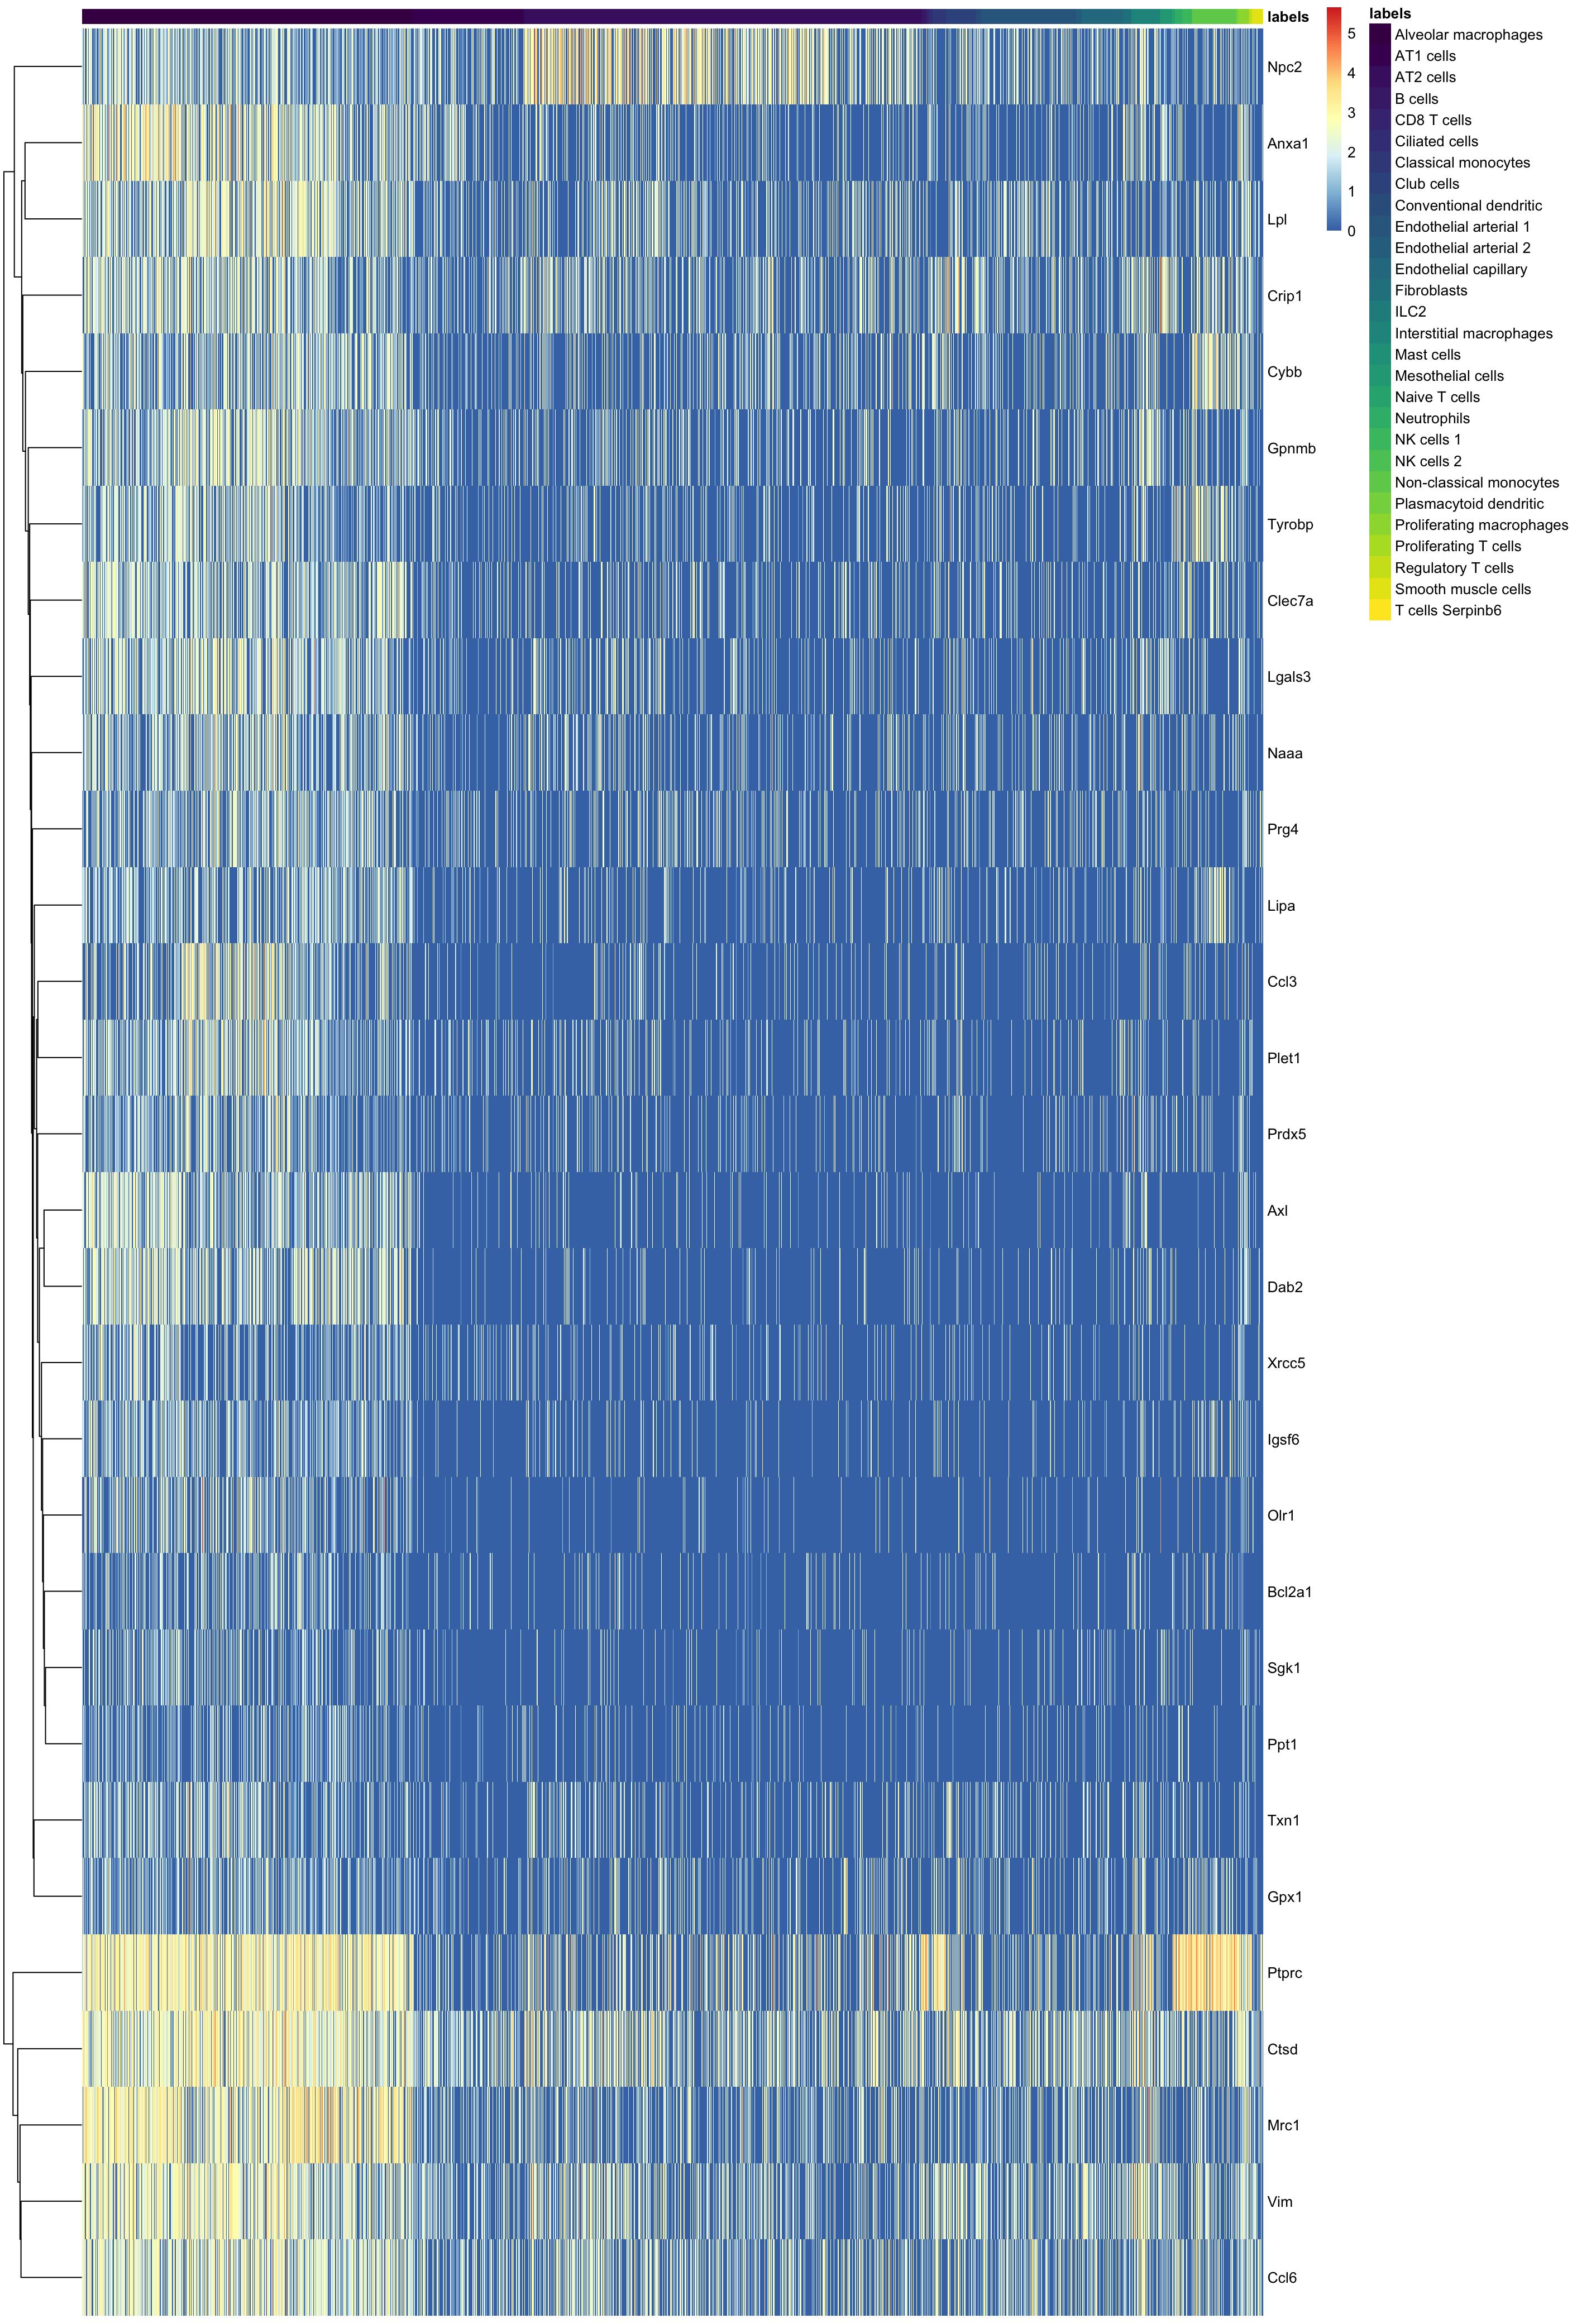 heatmap output